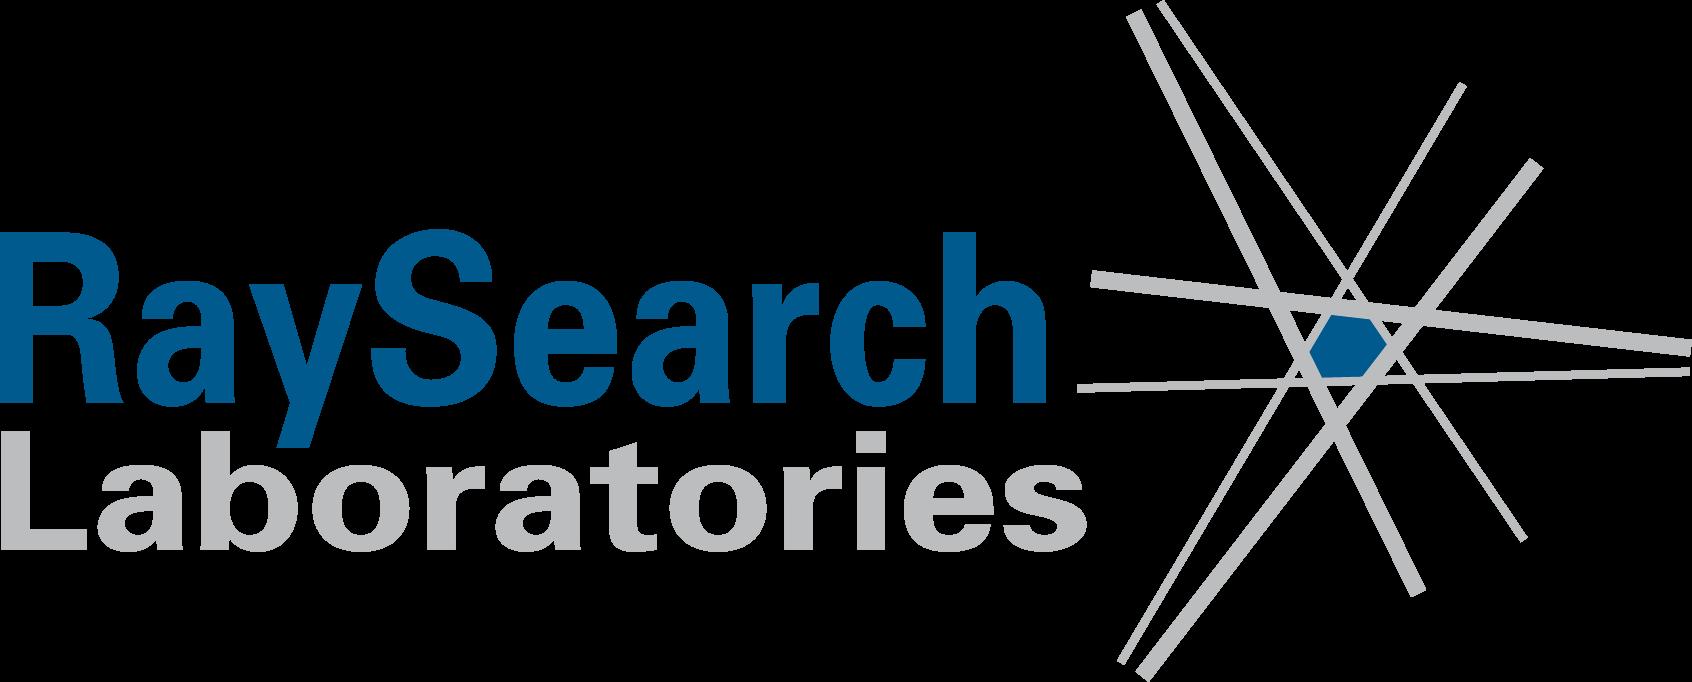 RaySearc_lab_logo